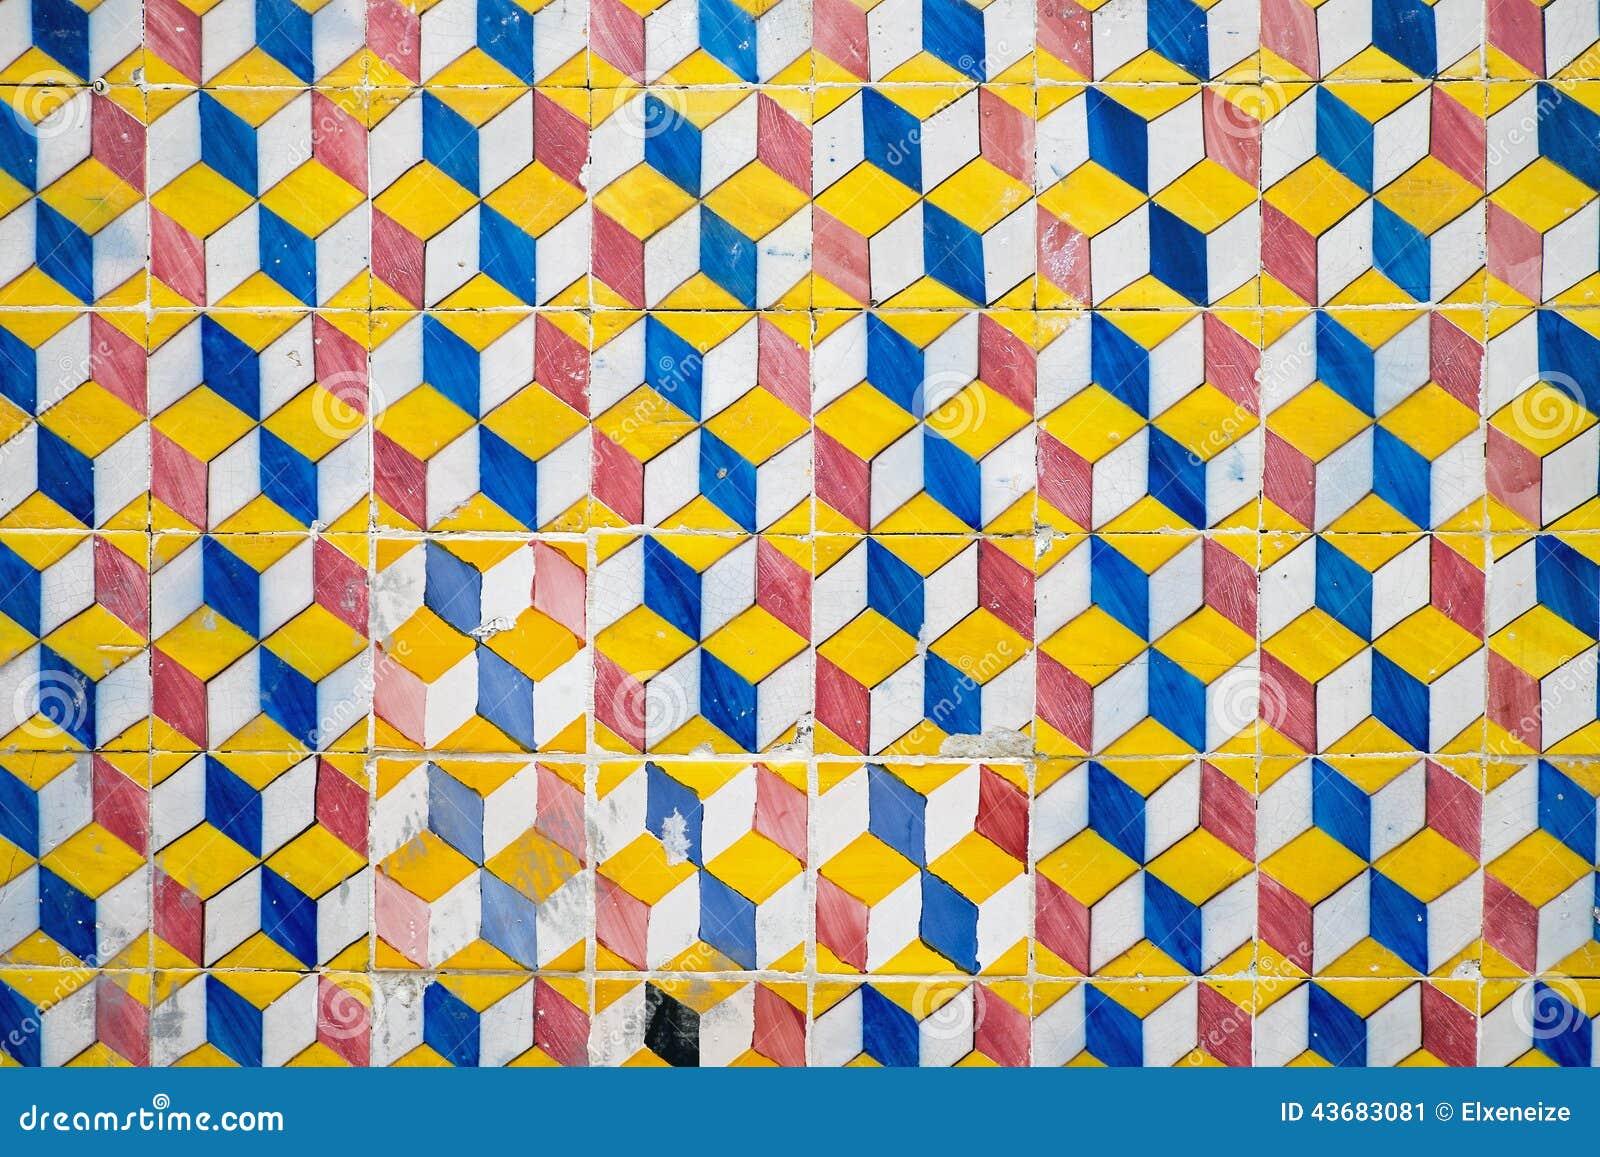 Oude tegels in portugal stock afbeelding afbeelding bestaande uit huis 43683081 - Oude patroon tegel ...